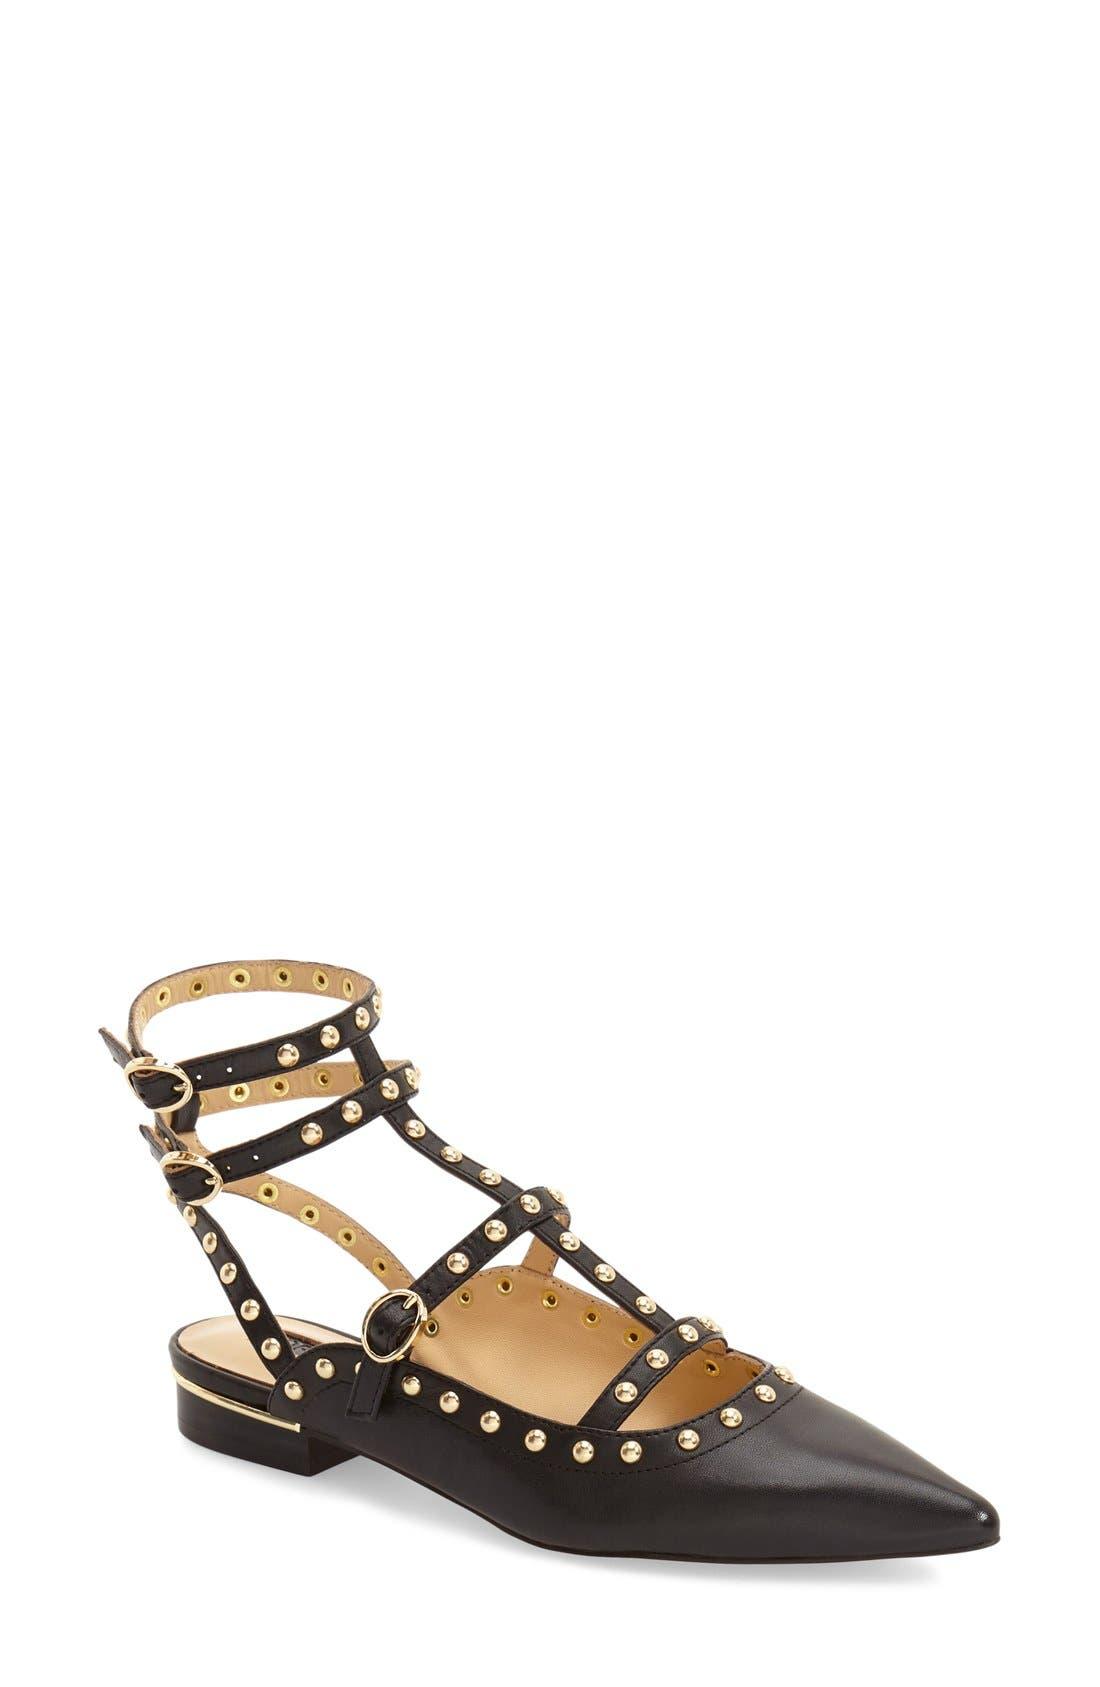 'Kate' Studded Cutout Sandal,                             Main thumbnail 1, color,                             001